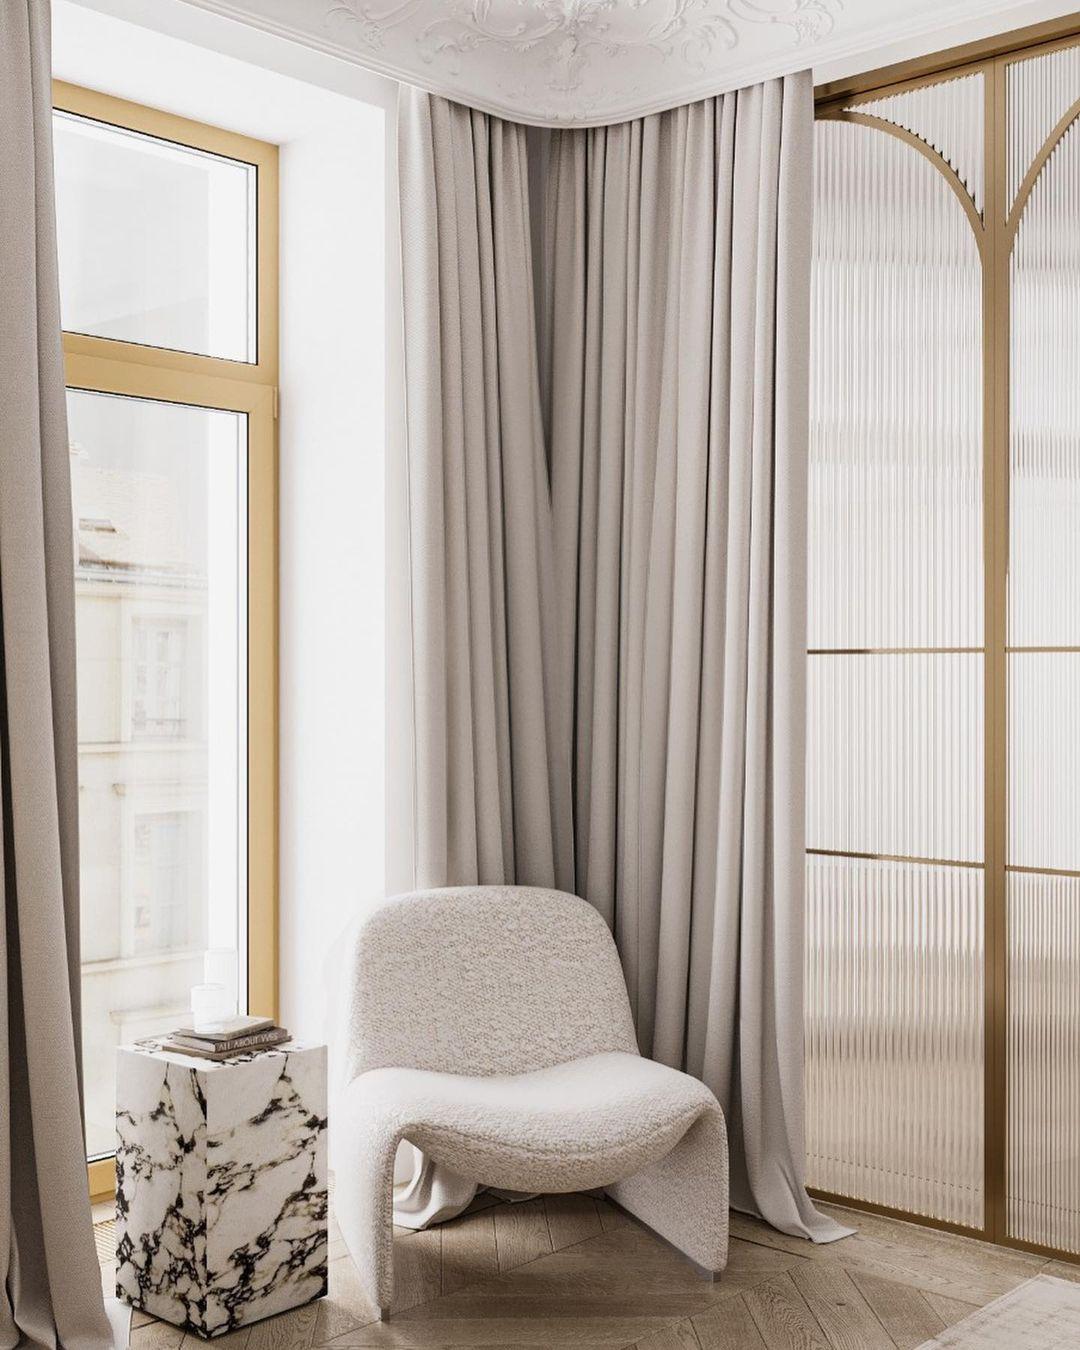 Как создать интерьер квартиры во французском стиле